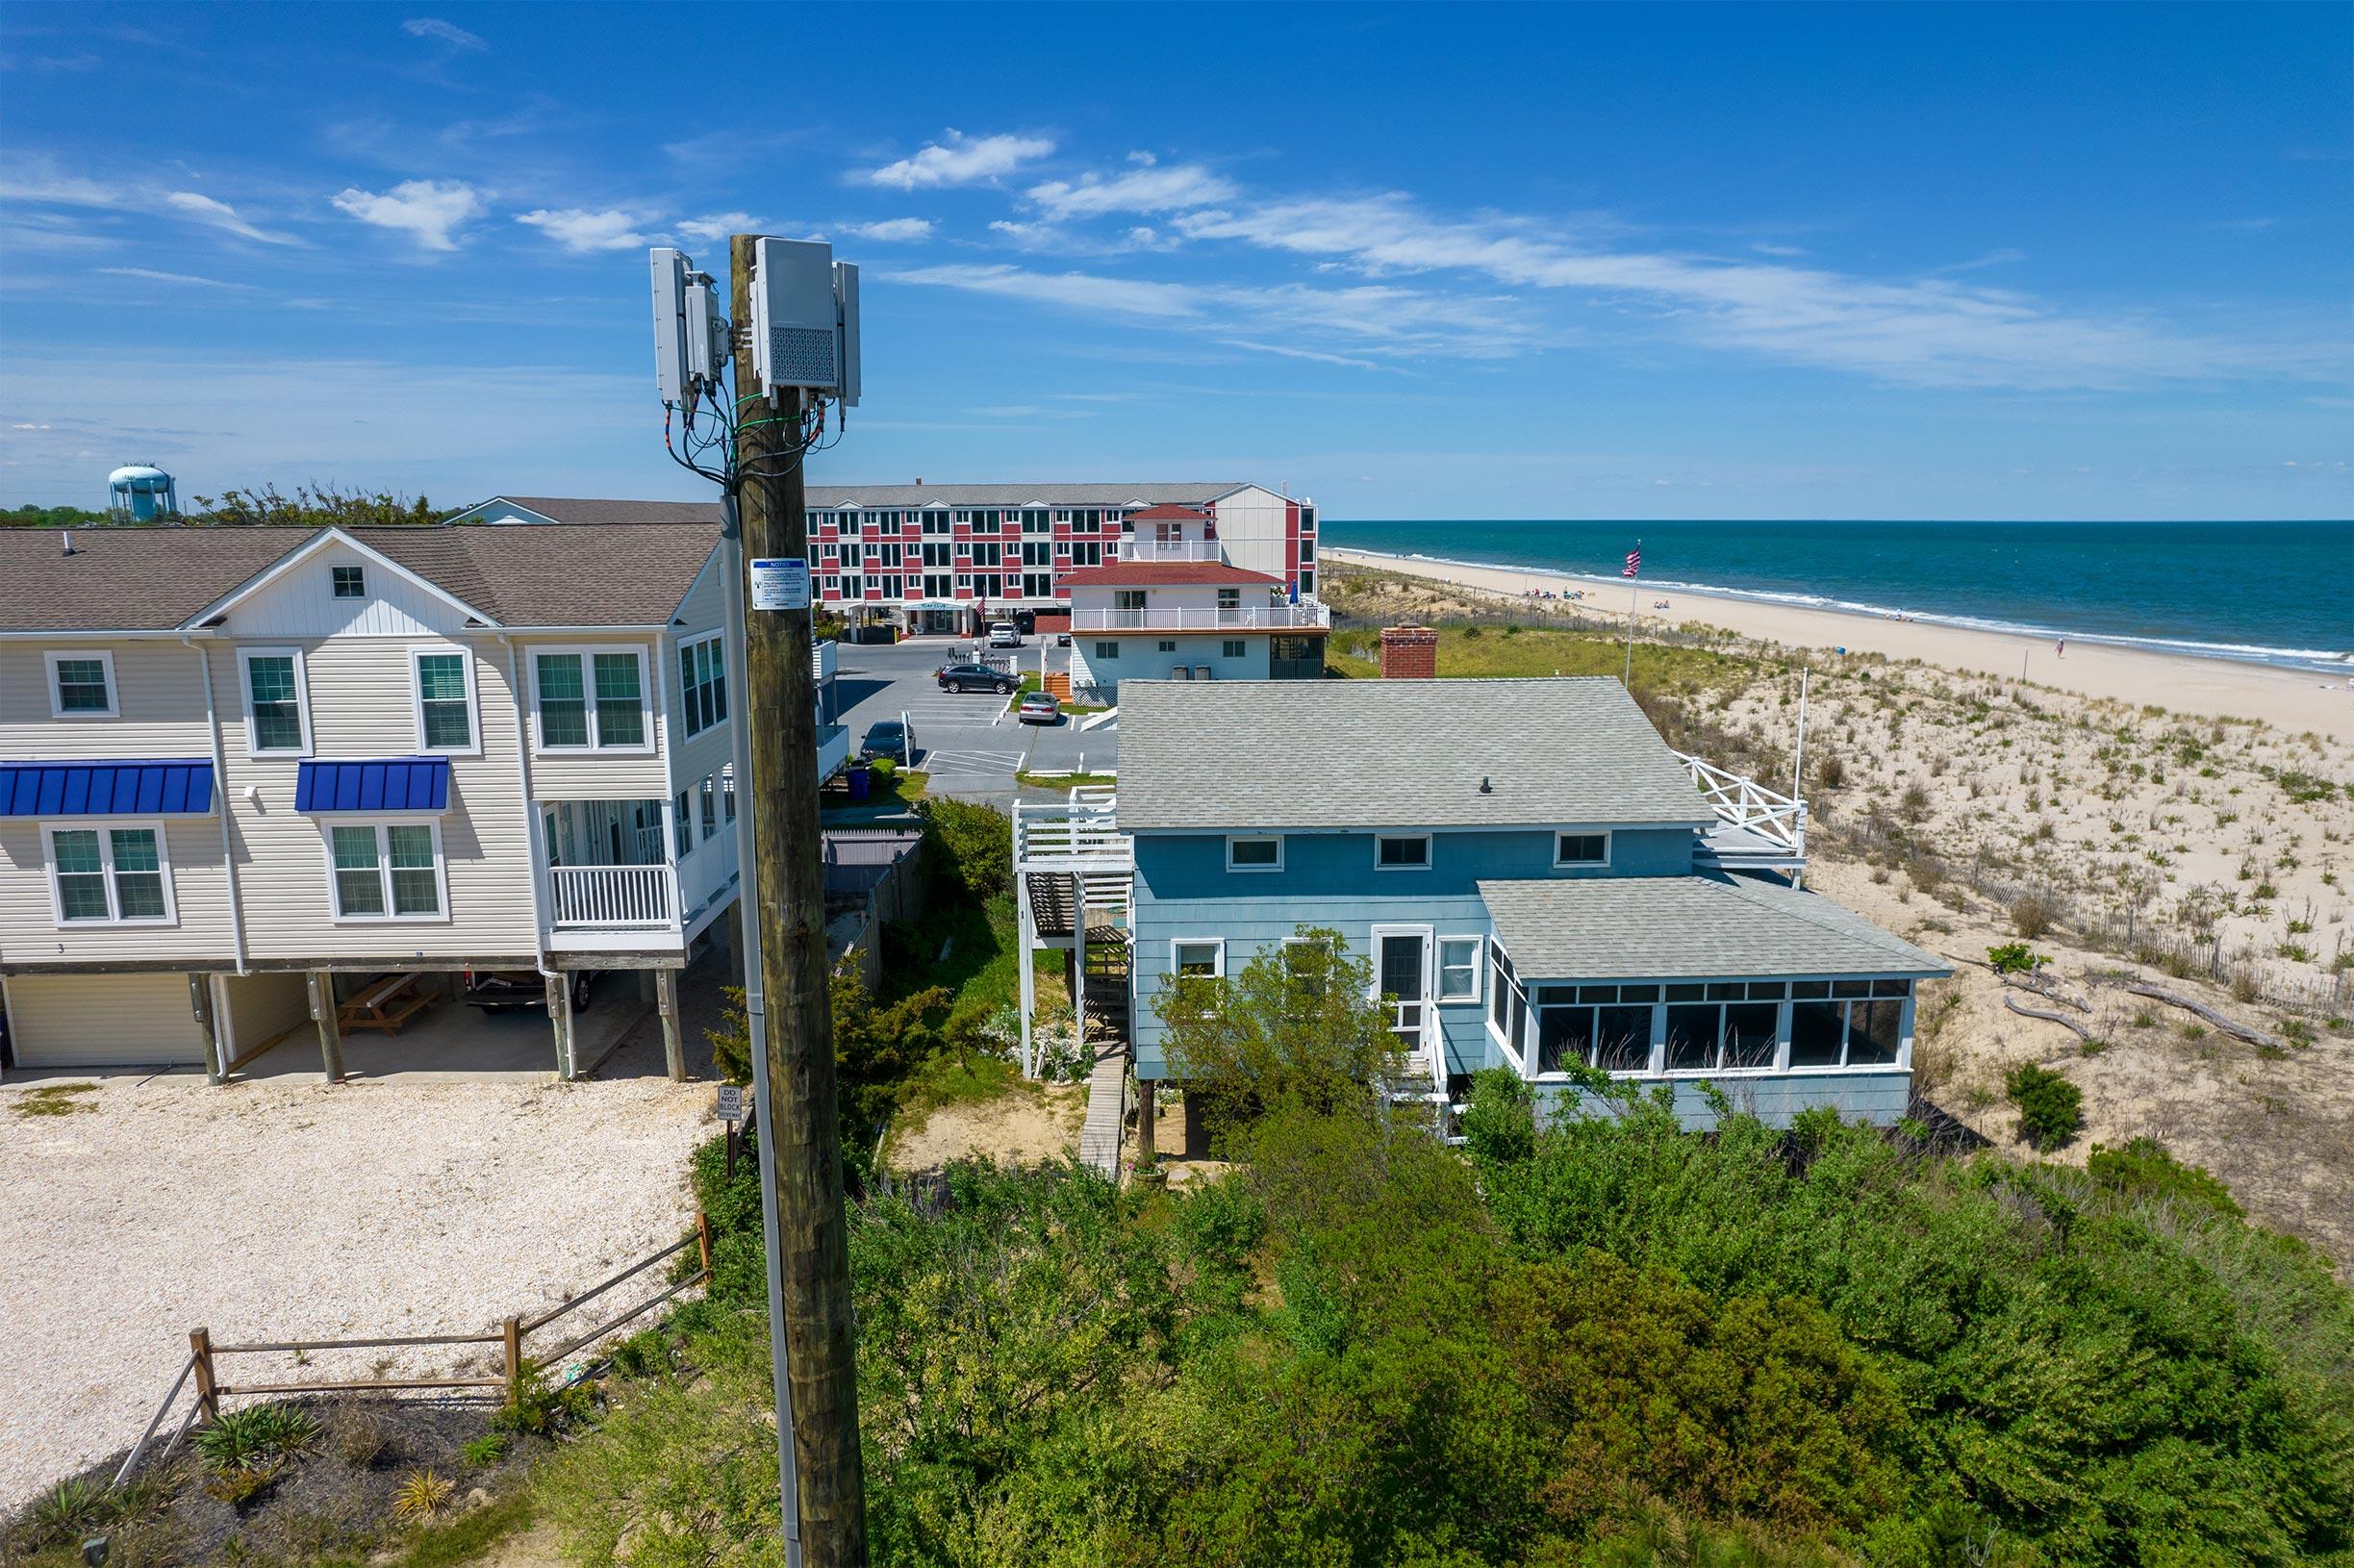 dewey beach 5G tower 3